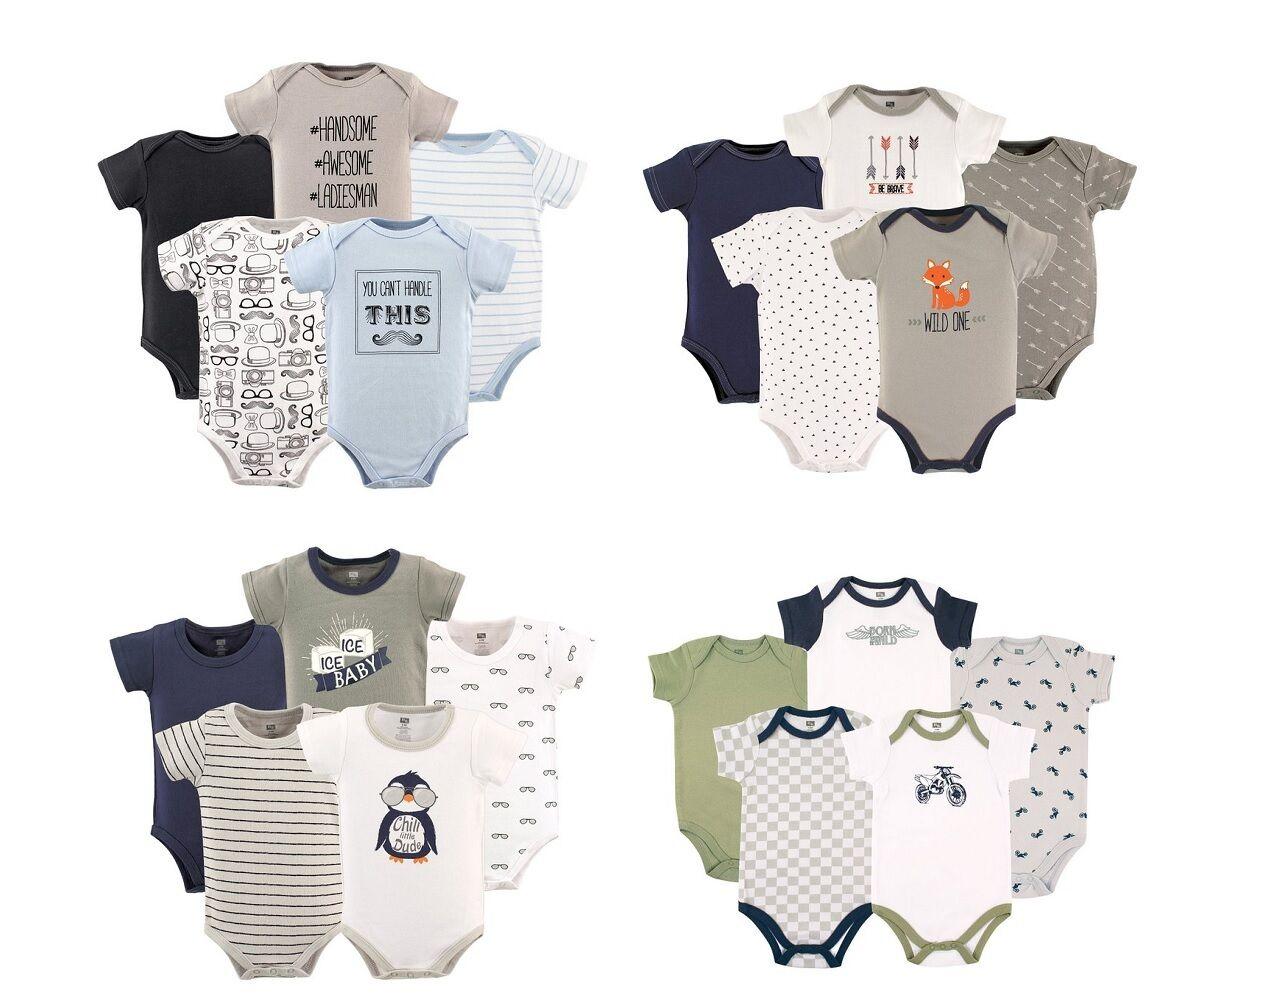 HUDSON BABY BOYS 5-PACK BODYSUITS COTTON NEWBORN TO 12 MONTH